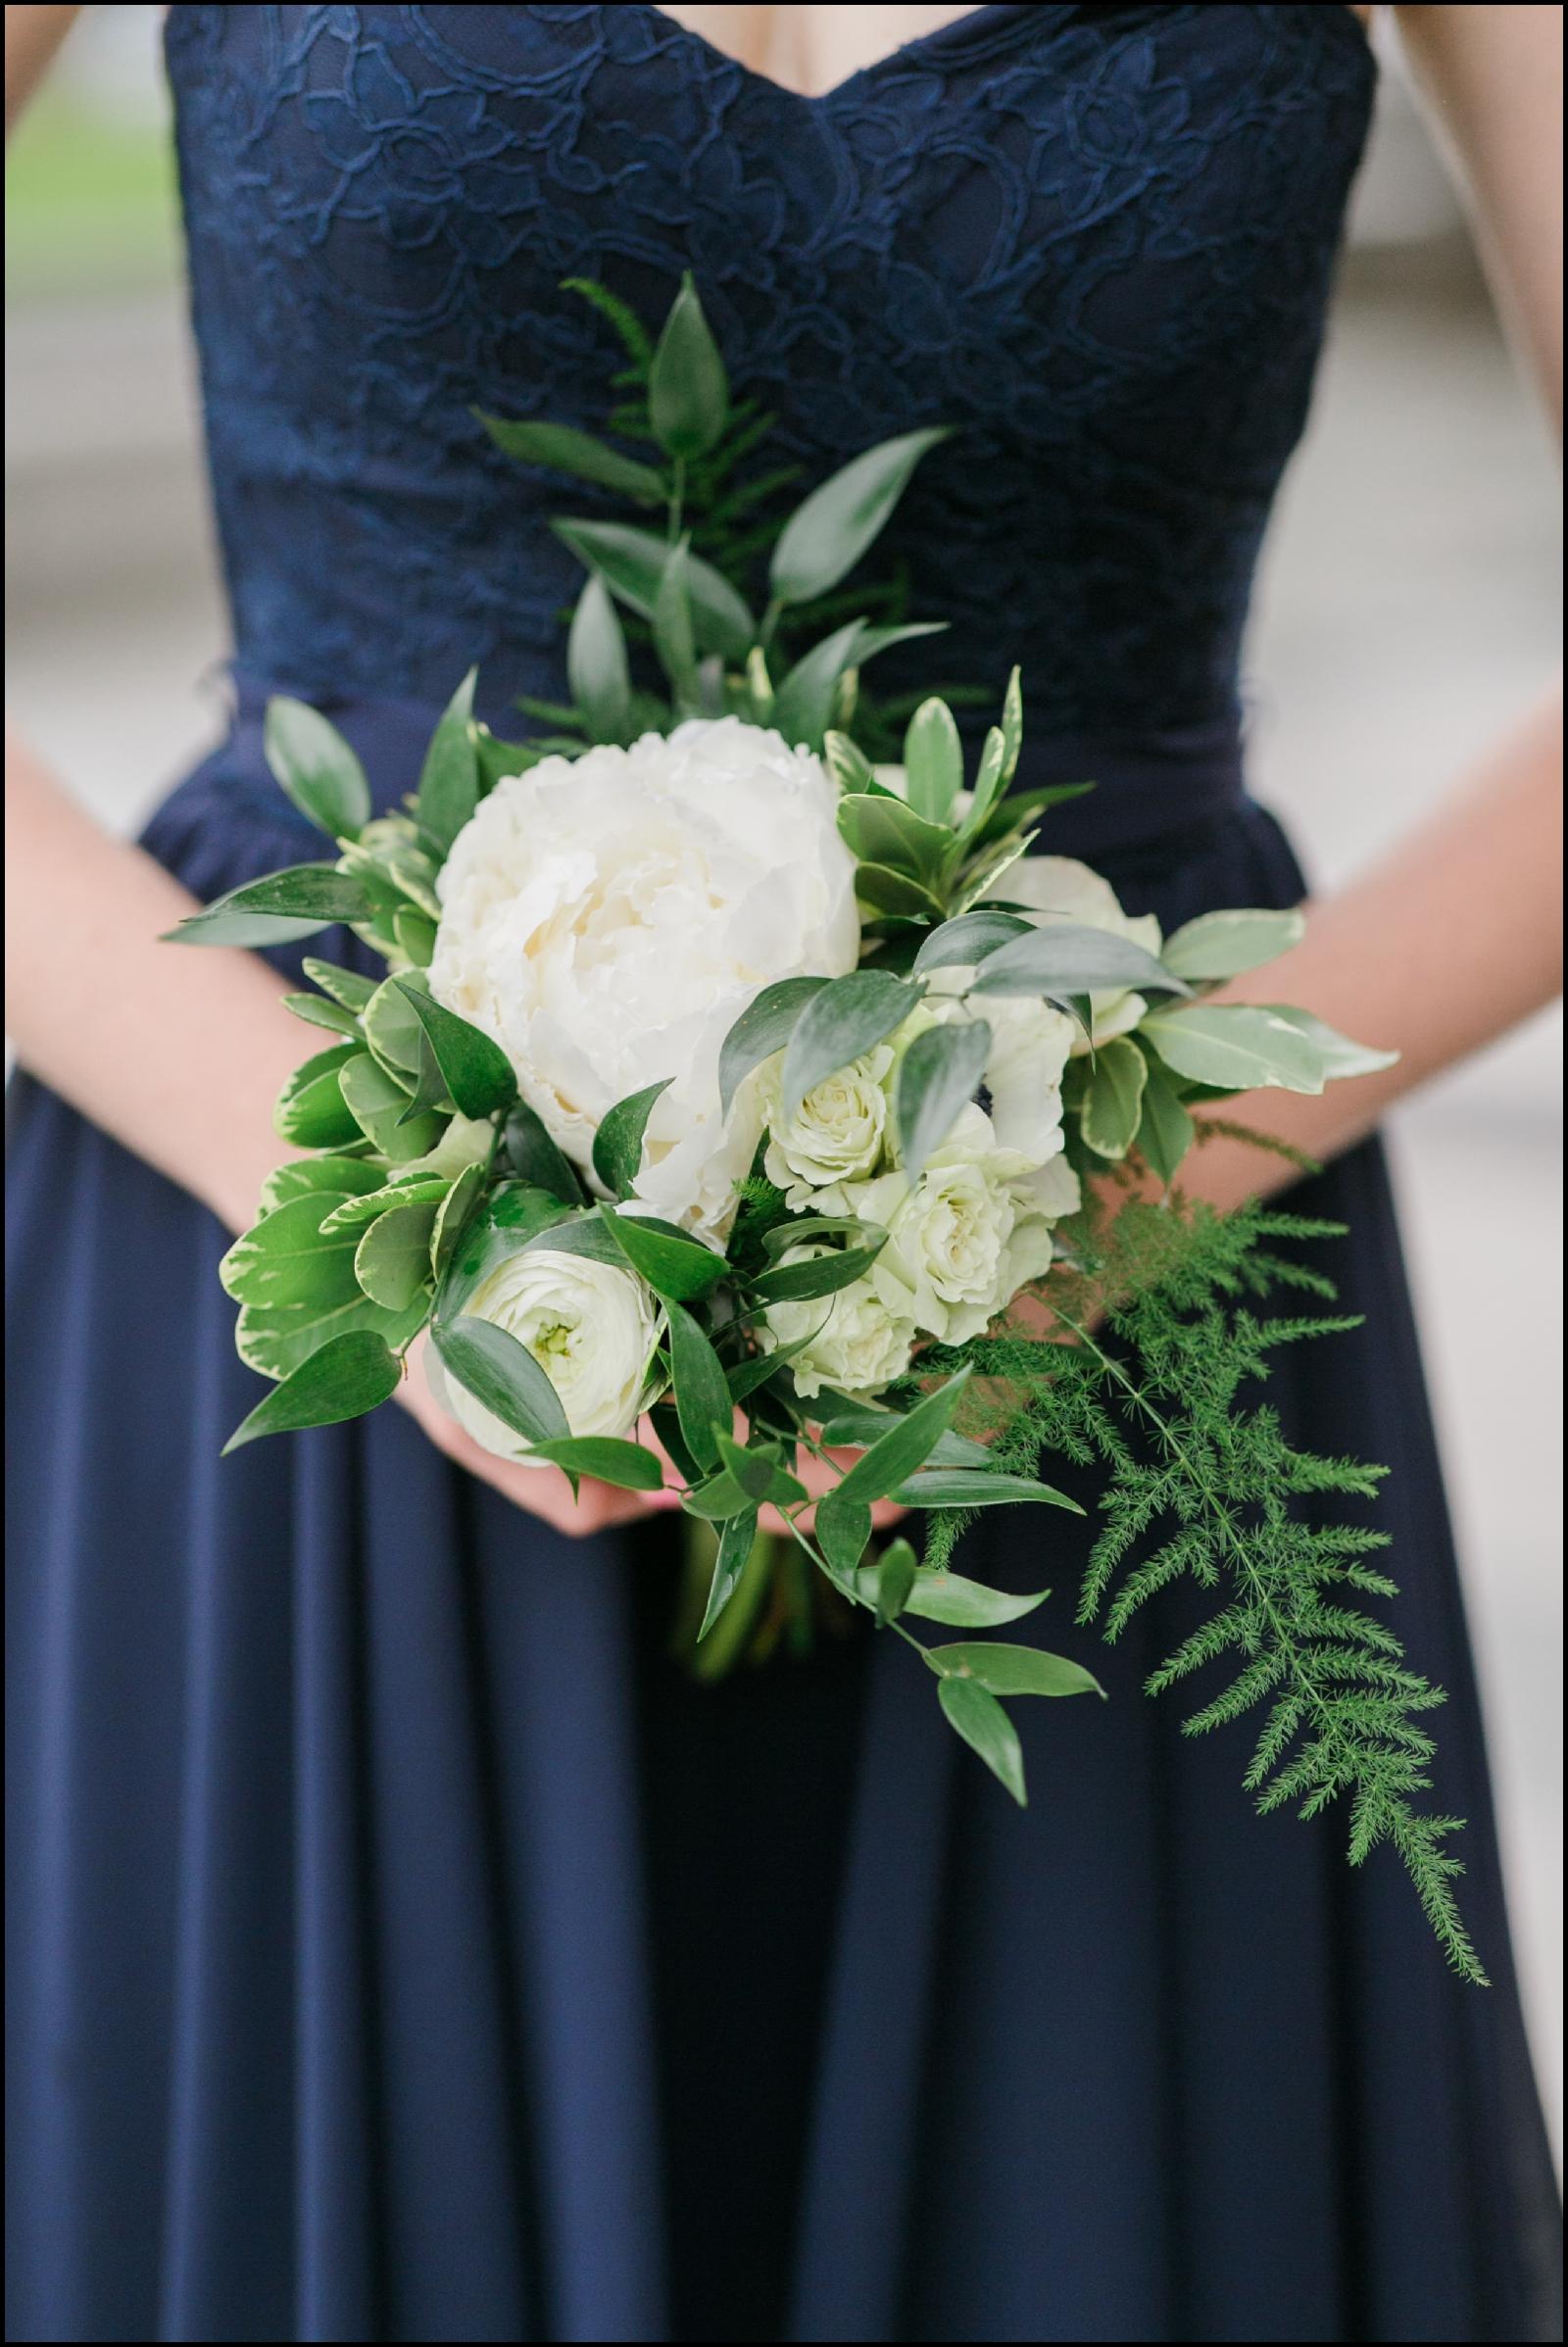 Bridemaid holding the wedding bouquet